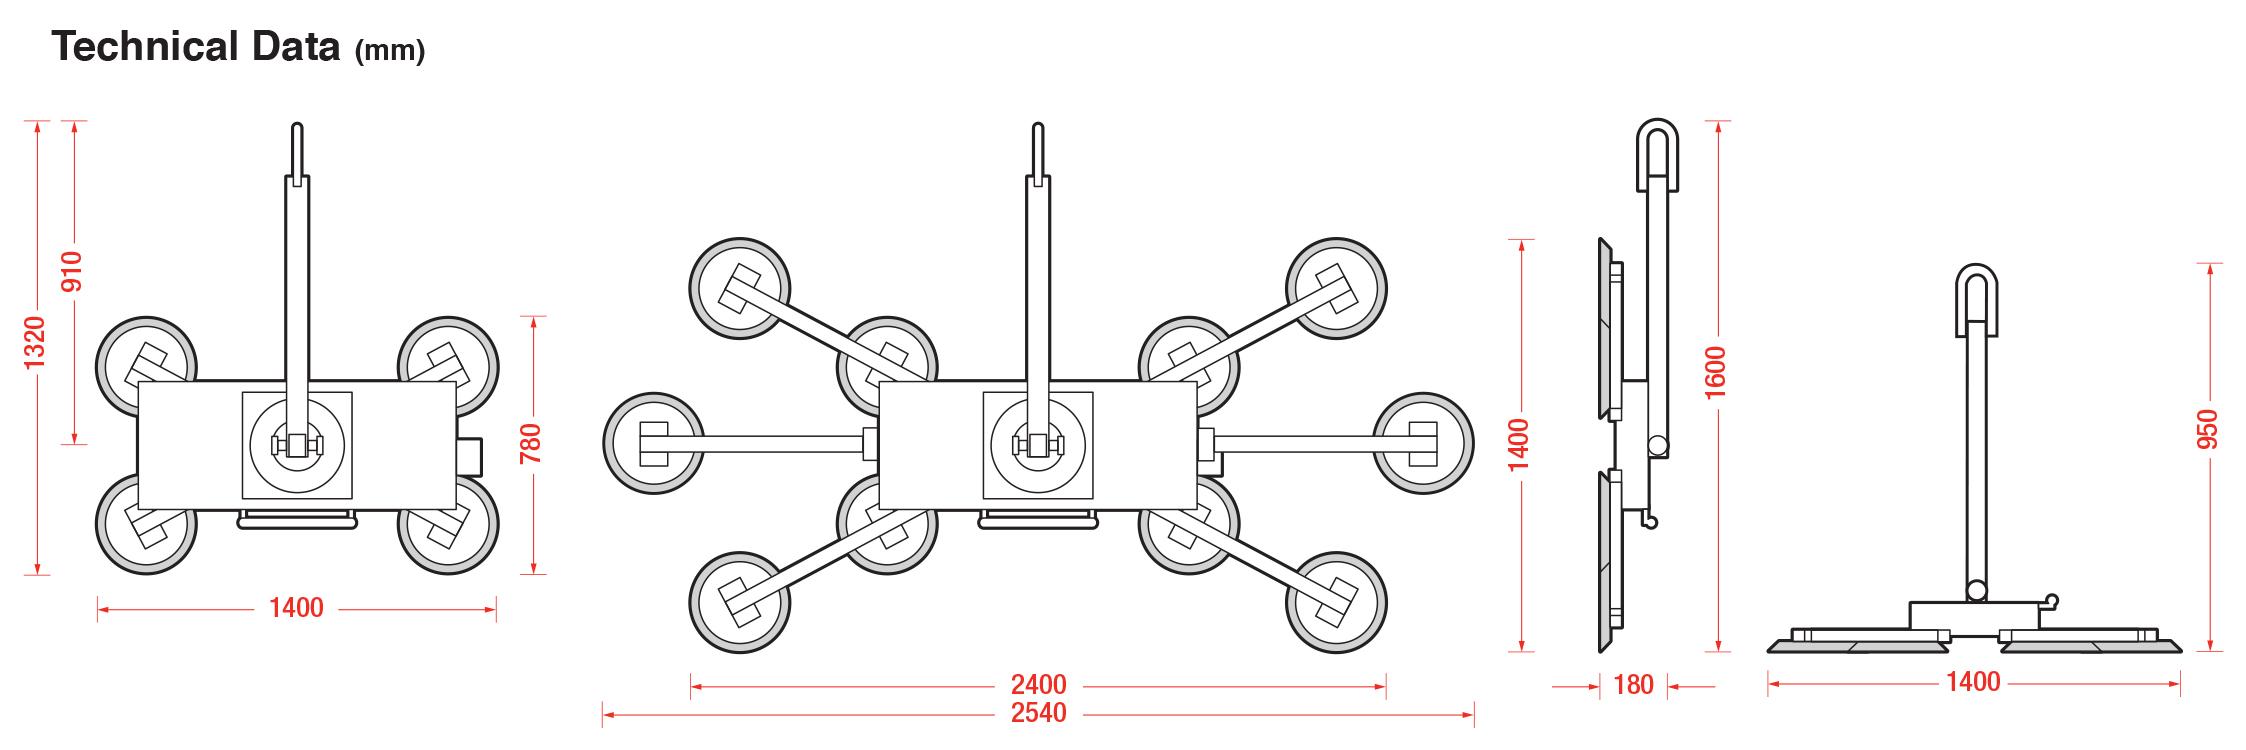 DSZ2 L Technical Data - Dimensions